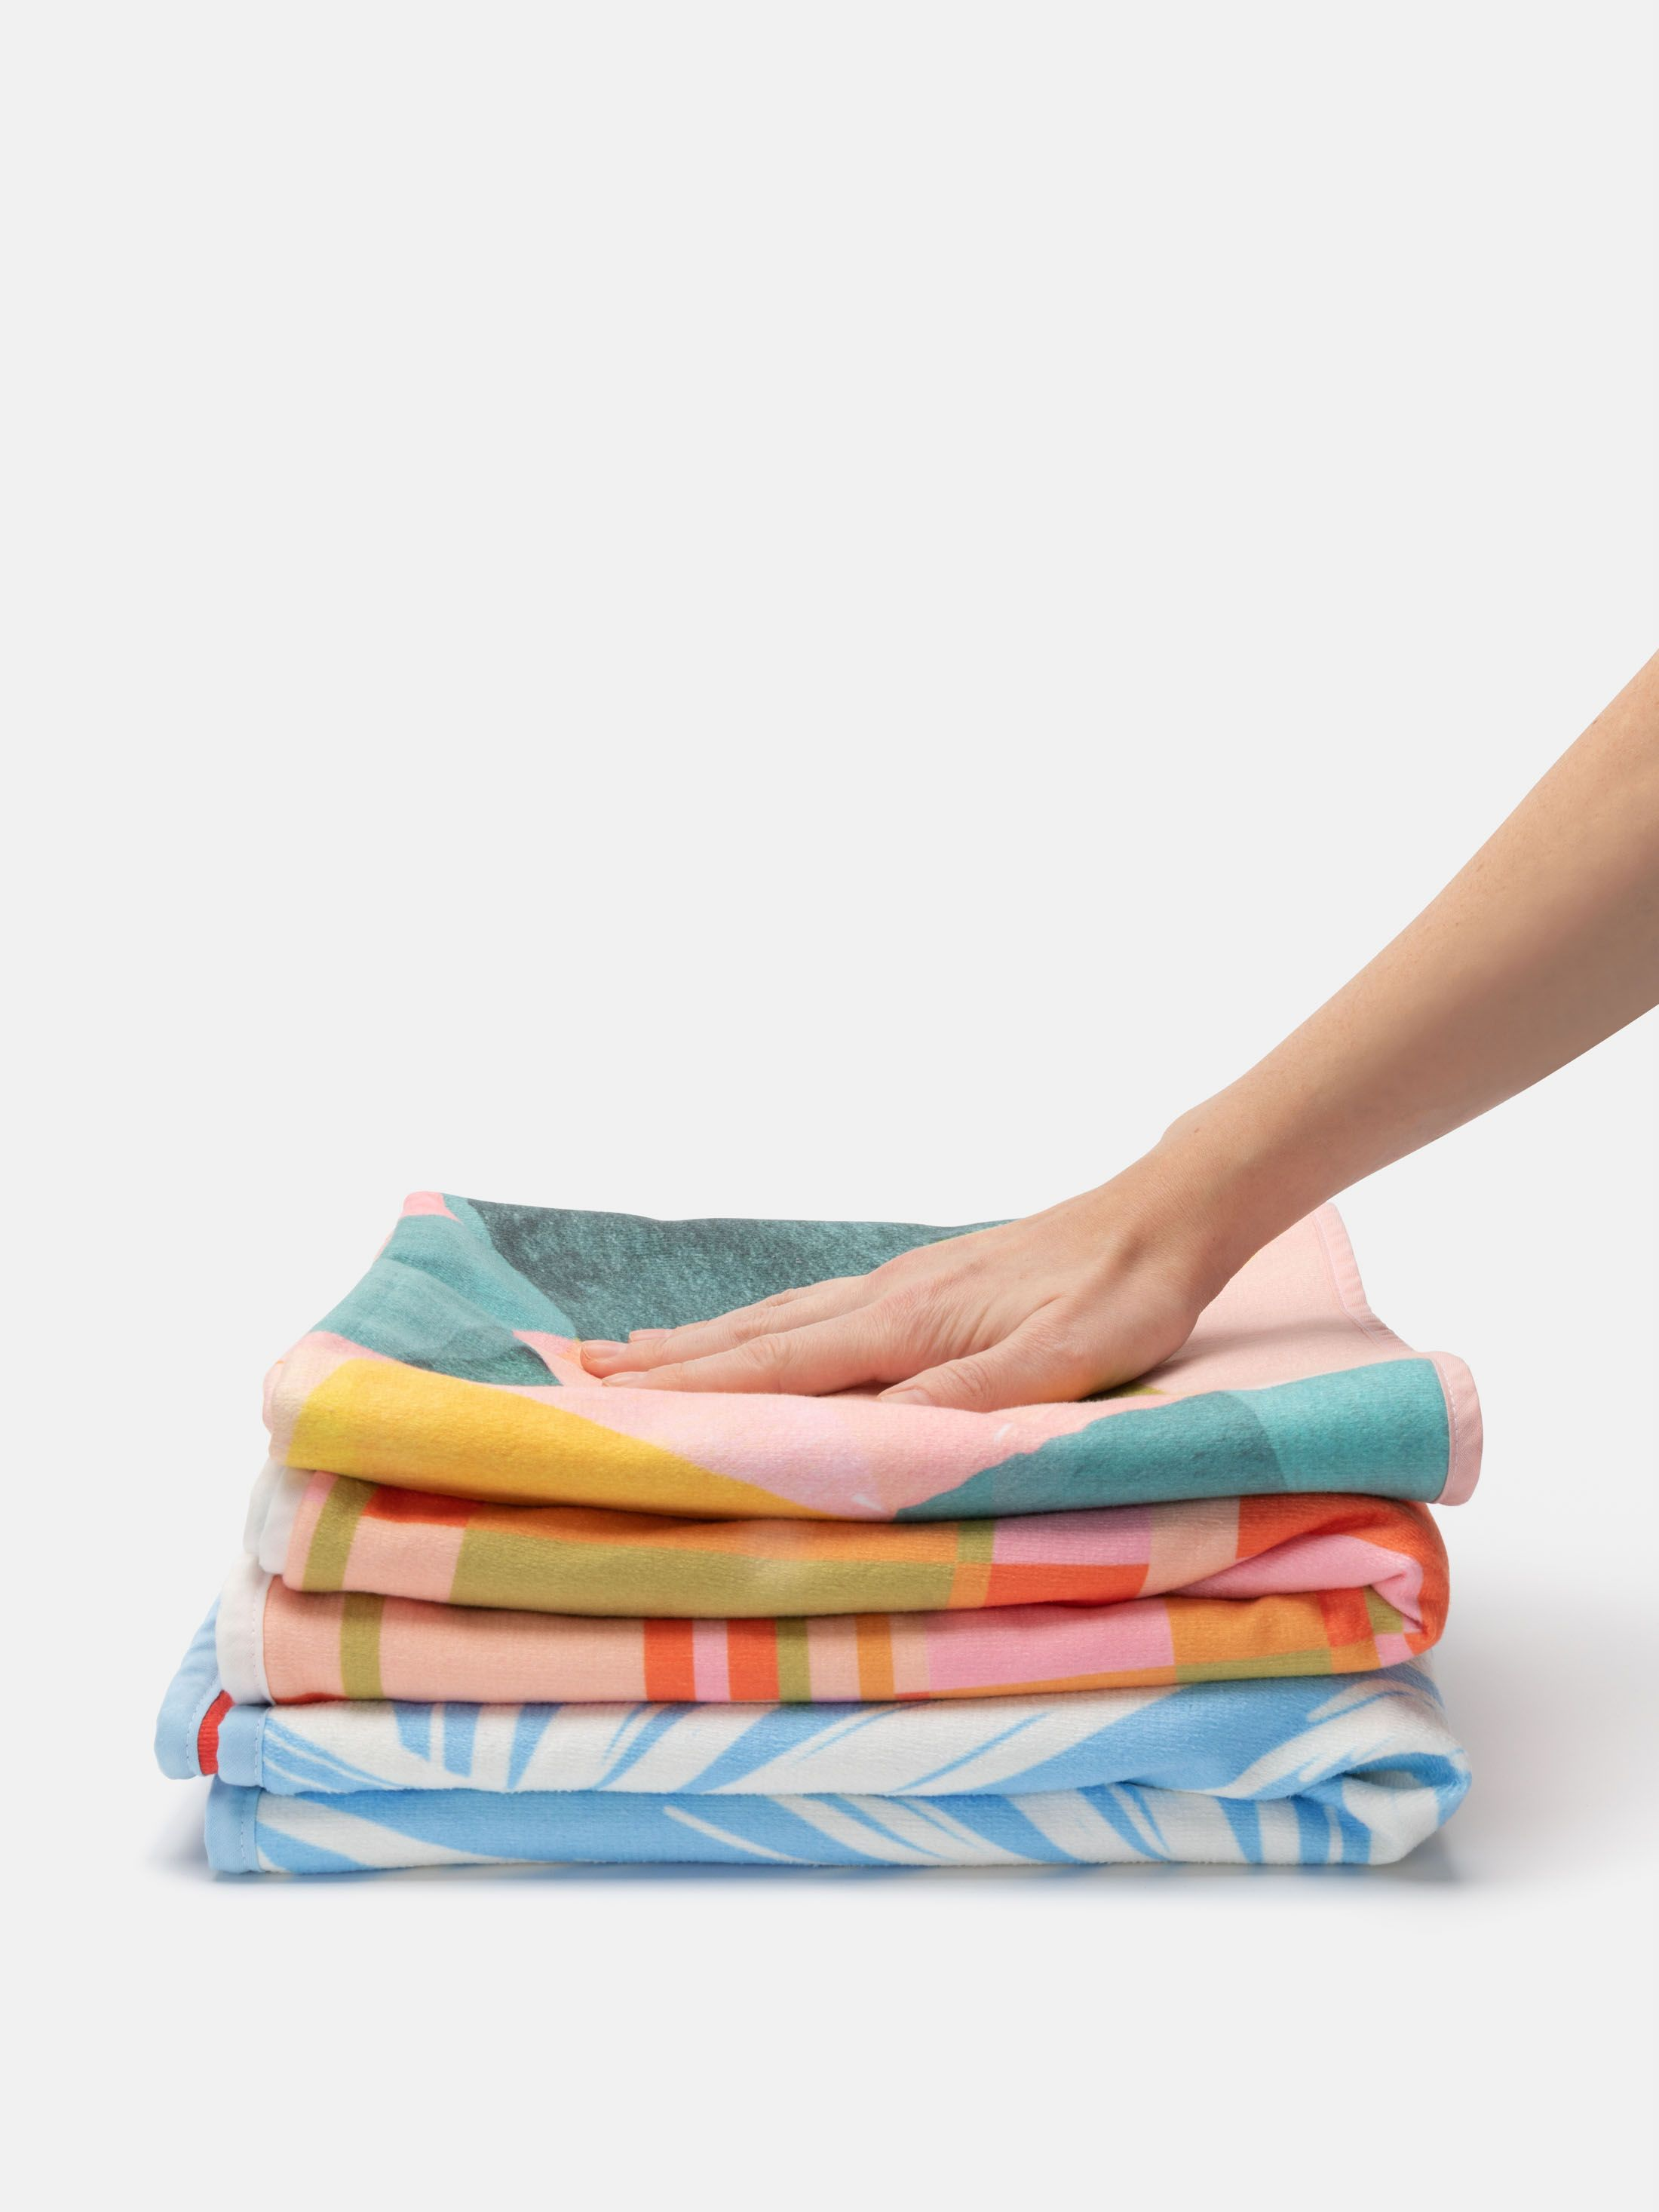 binding custom beach towels